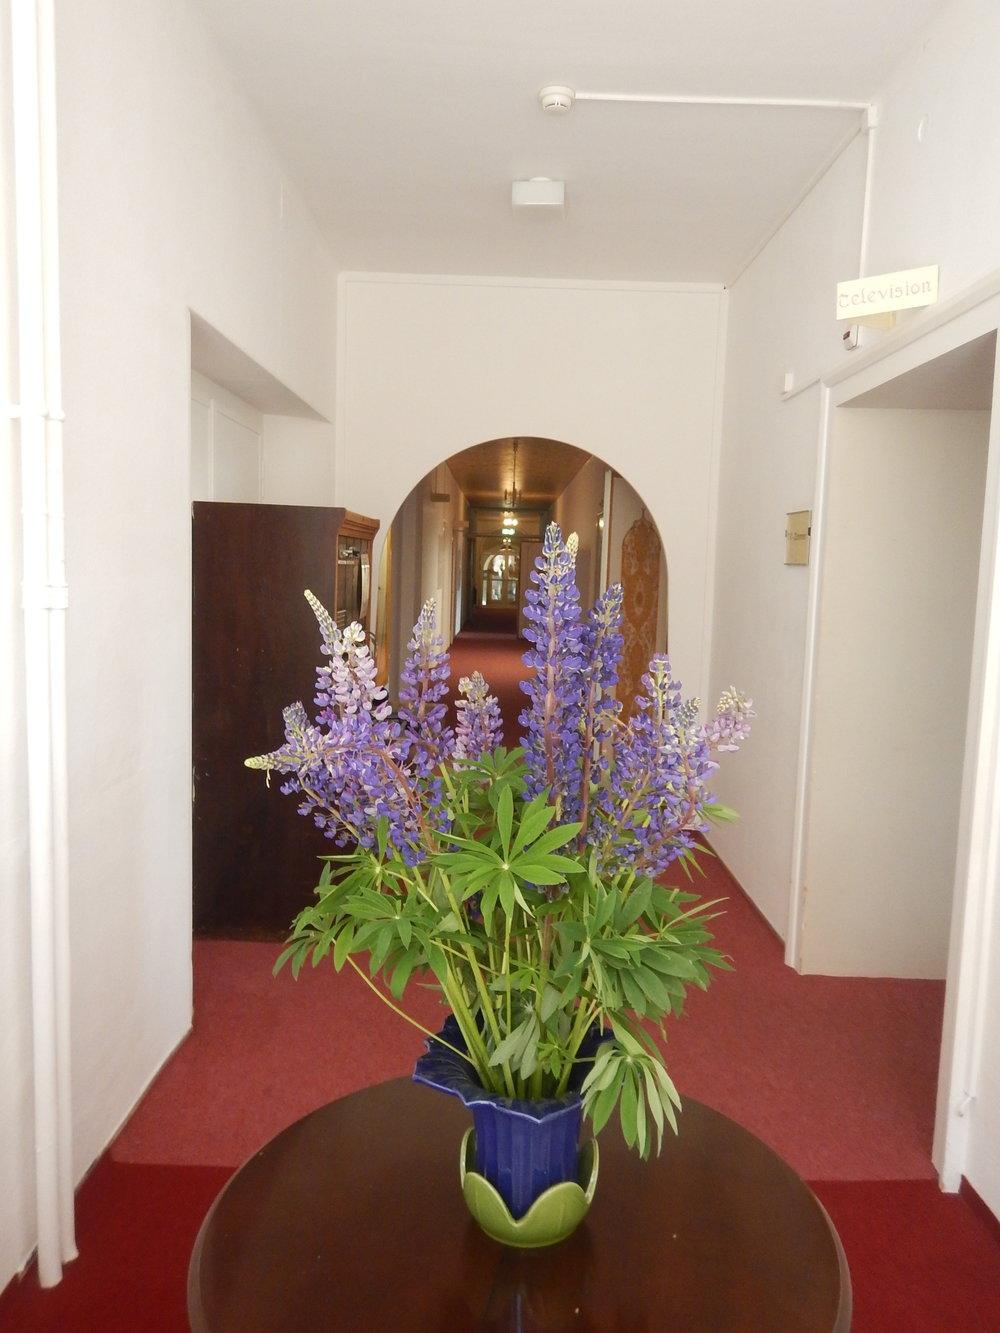 Wide passages make the hallways seem so elegant.